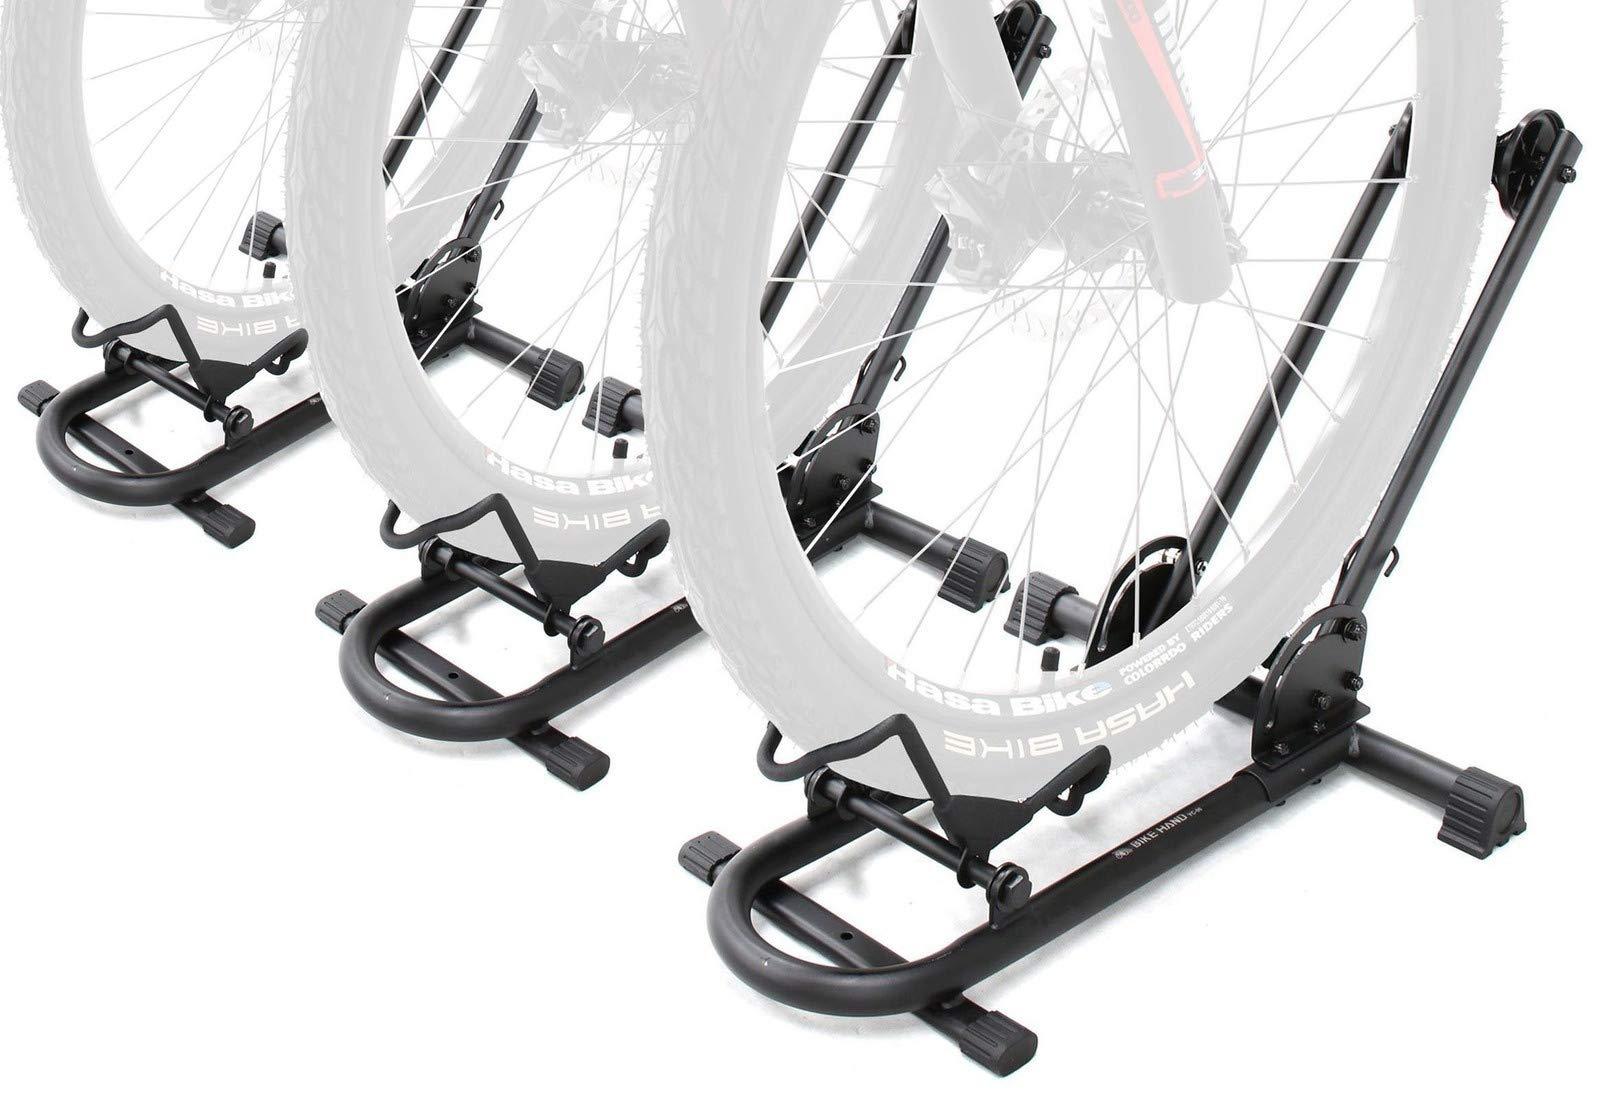 Bikehand Repacked Bicycle Floor Type Parking Rack Stand - for Mountain and Road Bike Indoor Outdoor Nook Garage Storage Pack of 3 by Bikehand